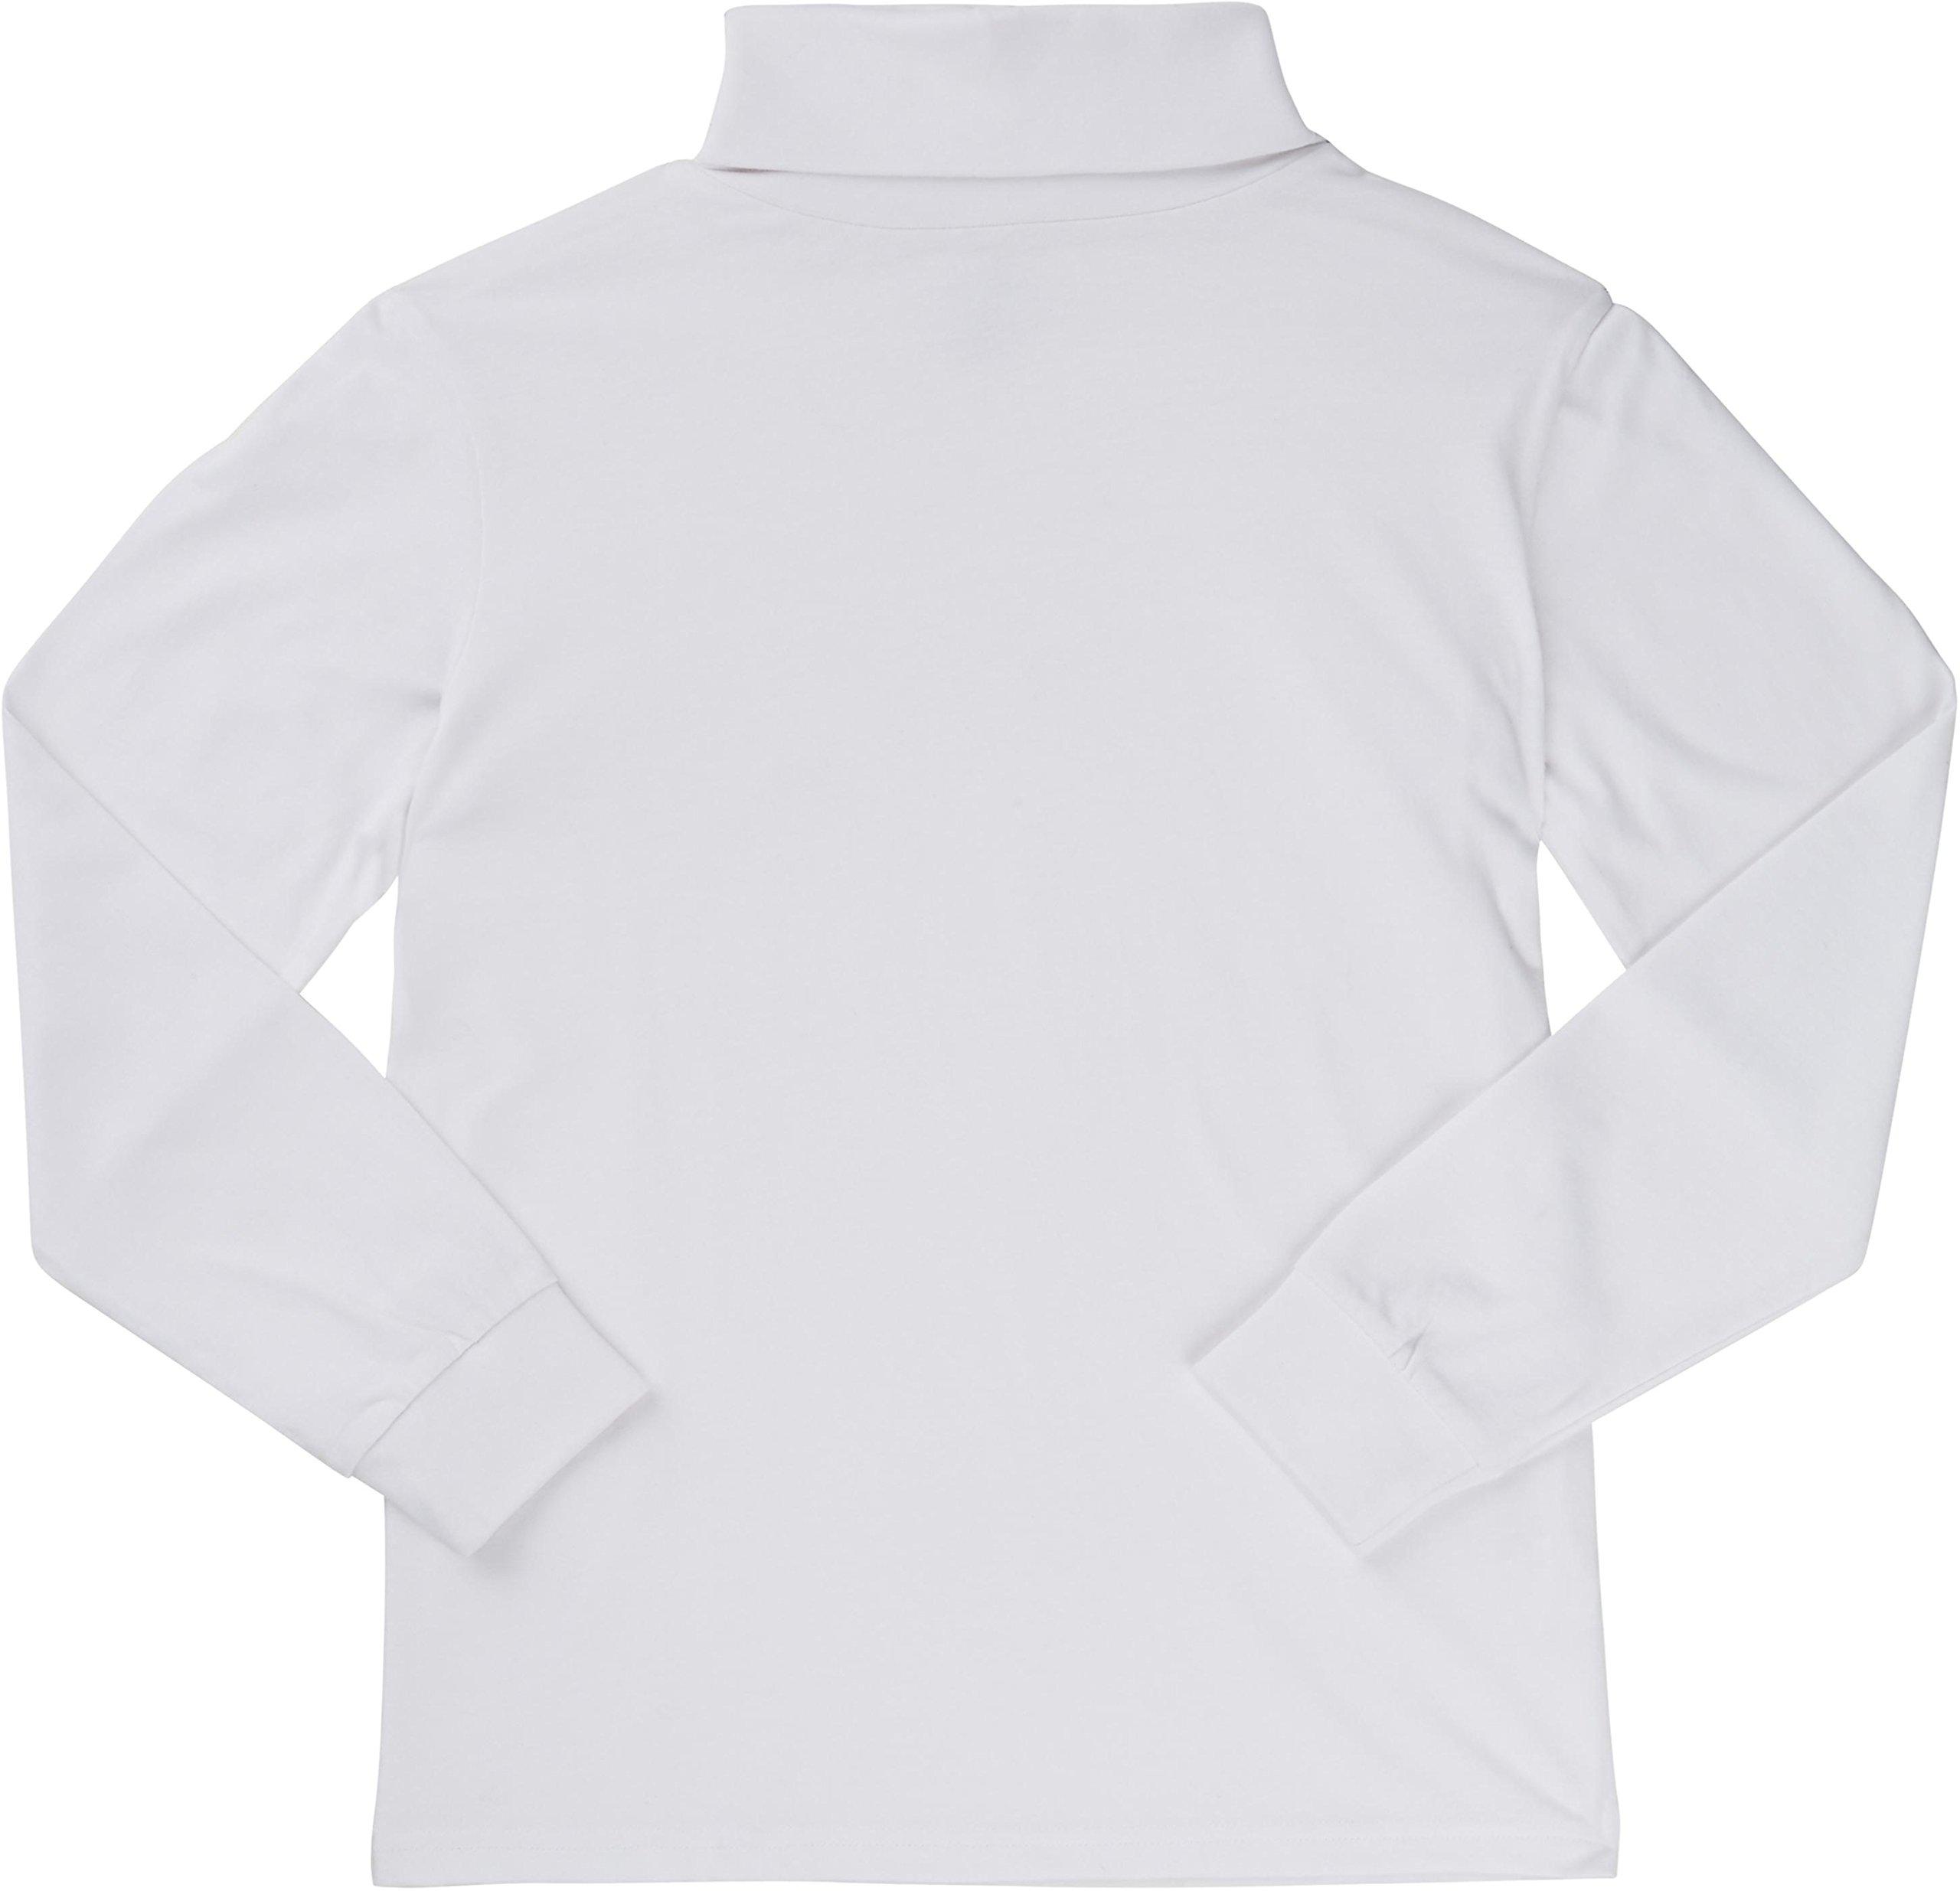 French Toast School Uniform Boys Long Sleeve Turtleneck T-Shirt, White, 5